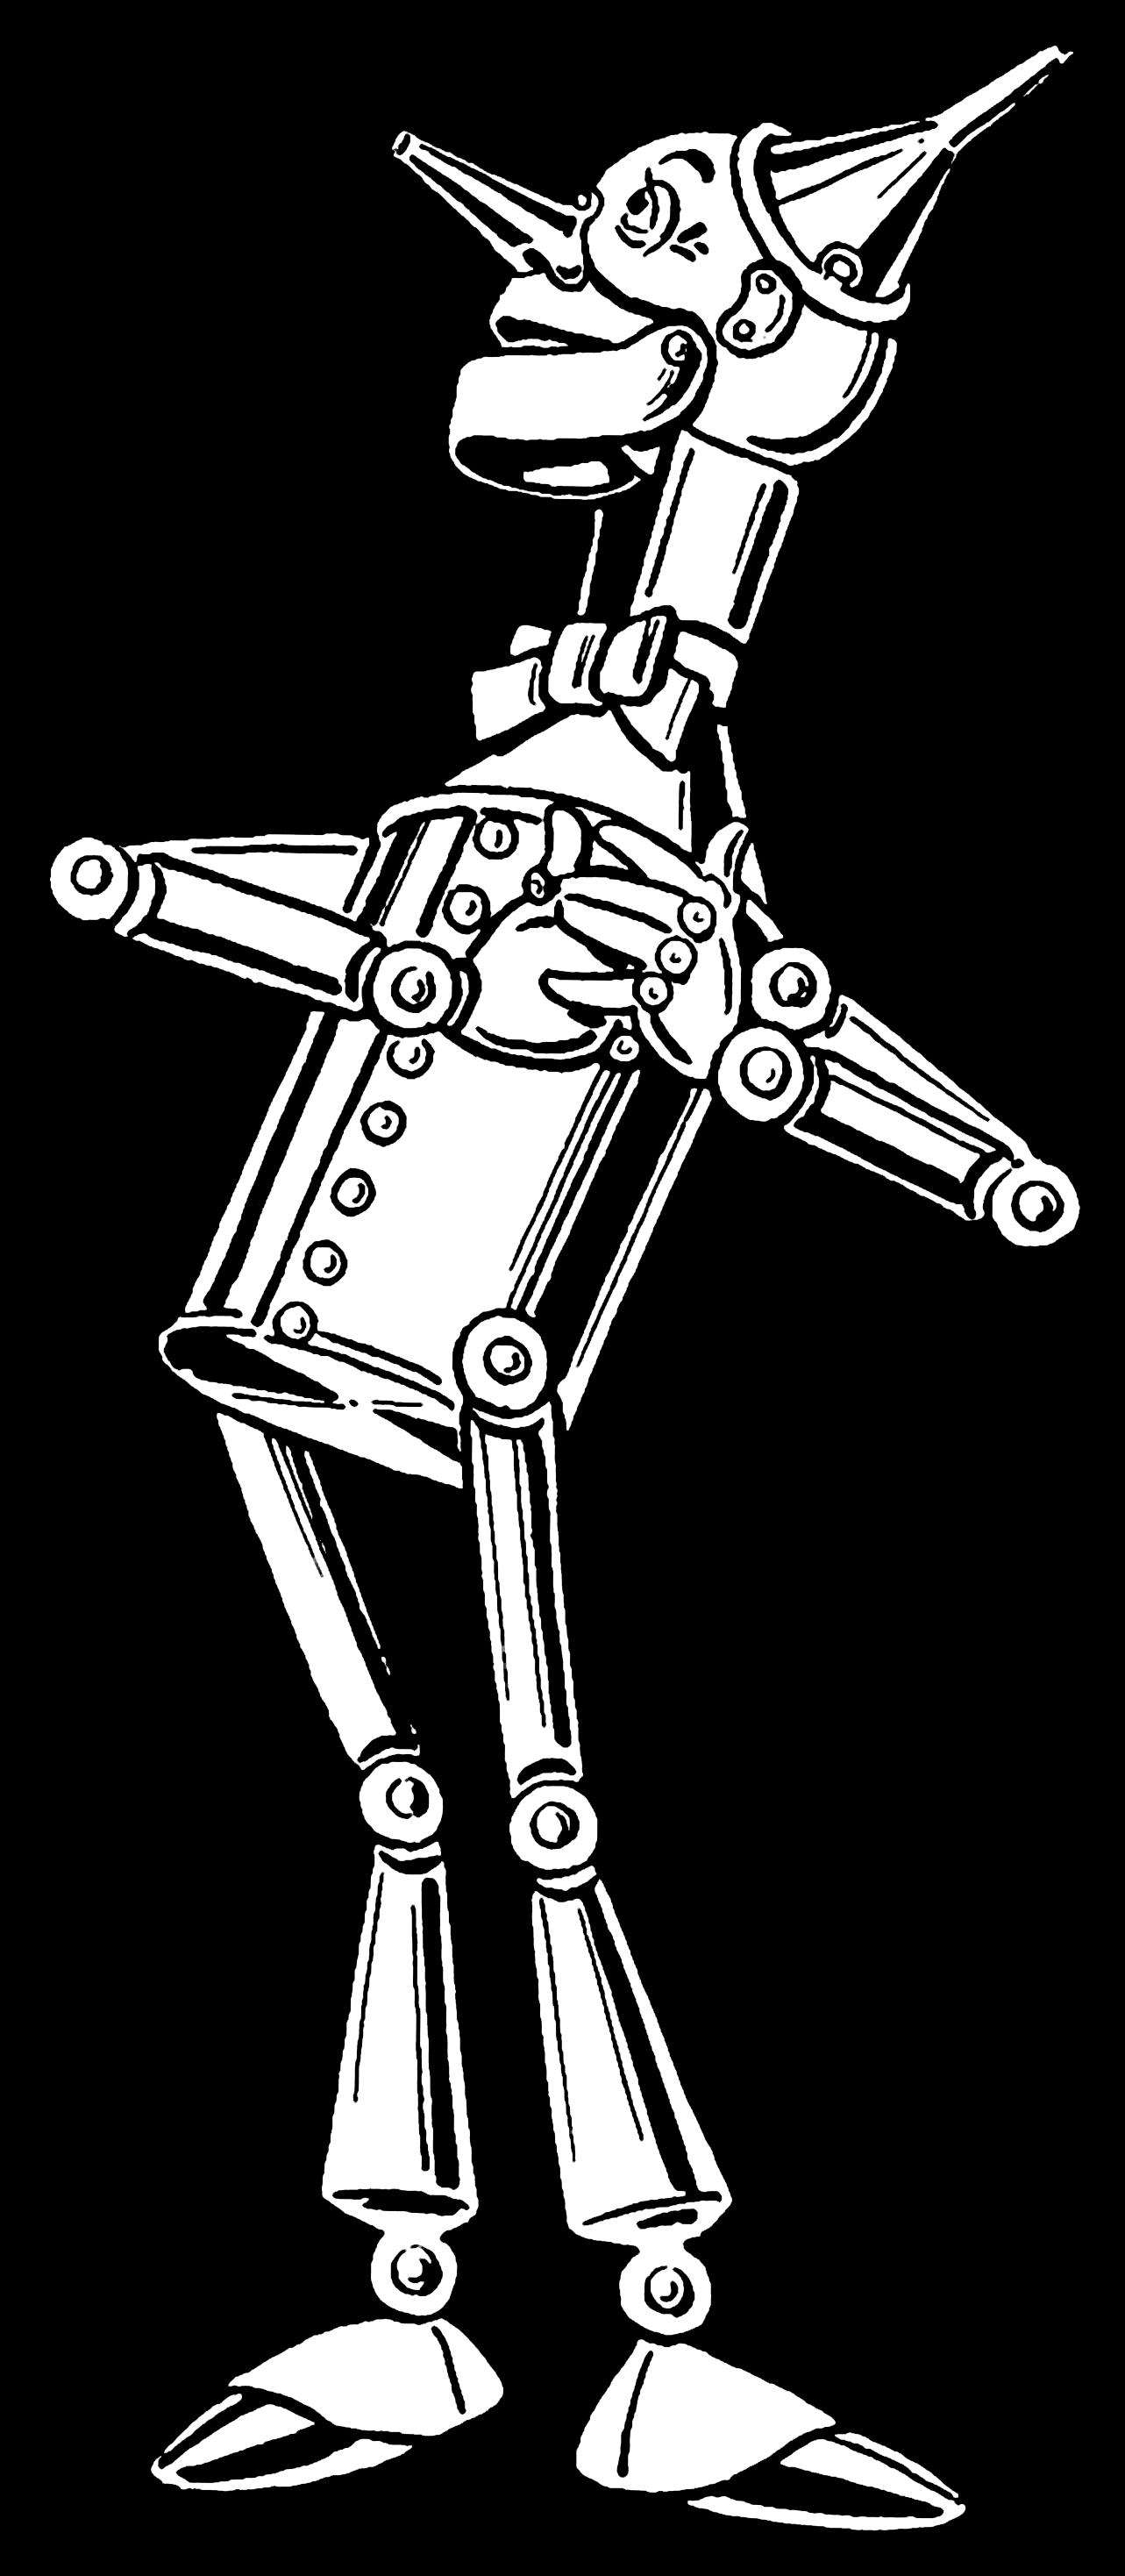 Wizard of oz tinman clipart png freeuse stock Tin Woodman - Wikipedia png freeuse stock